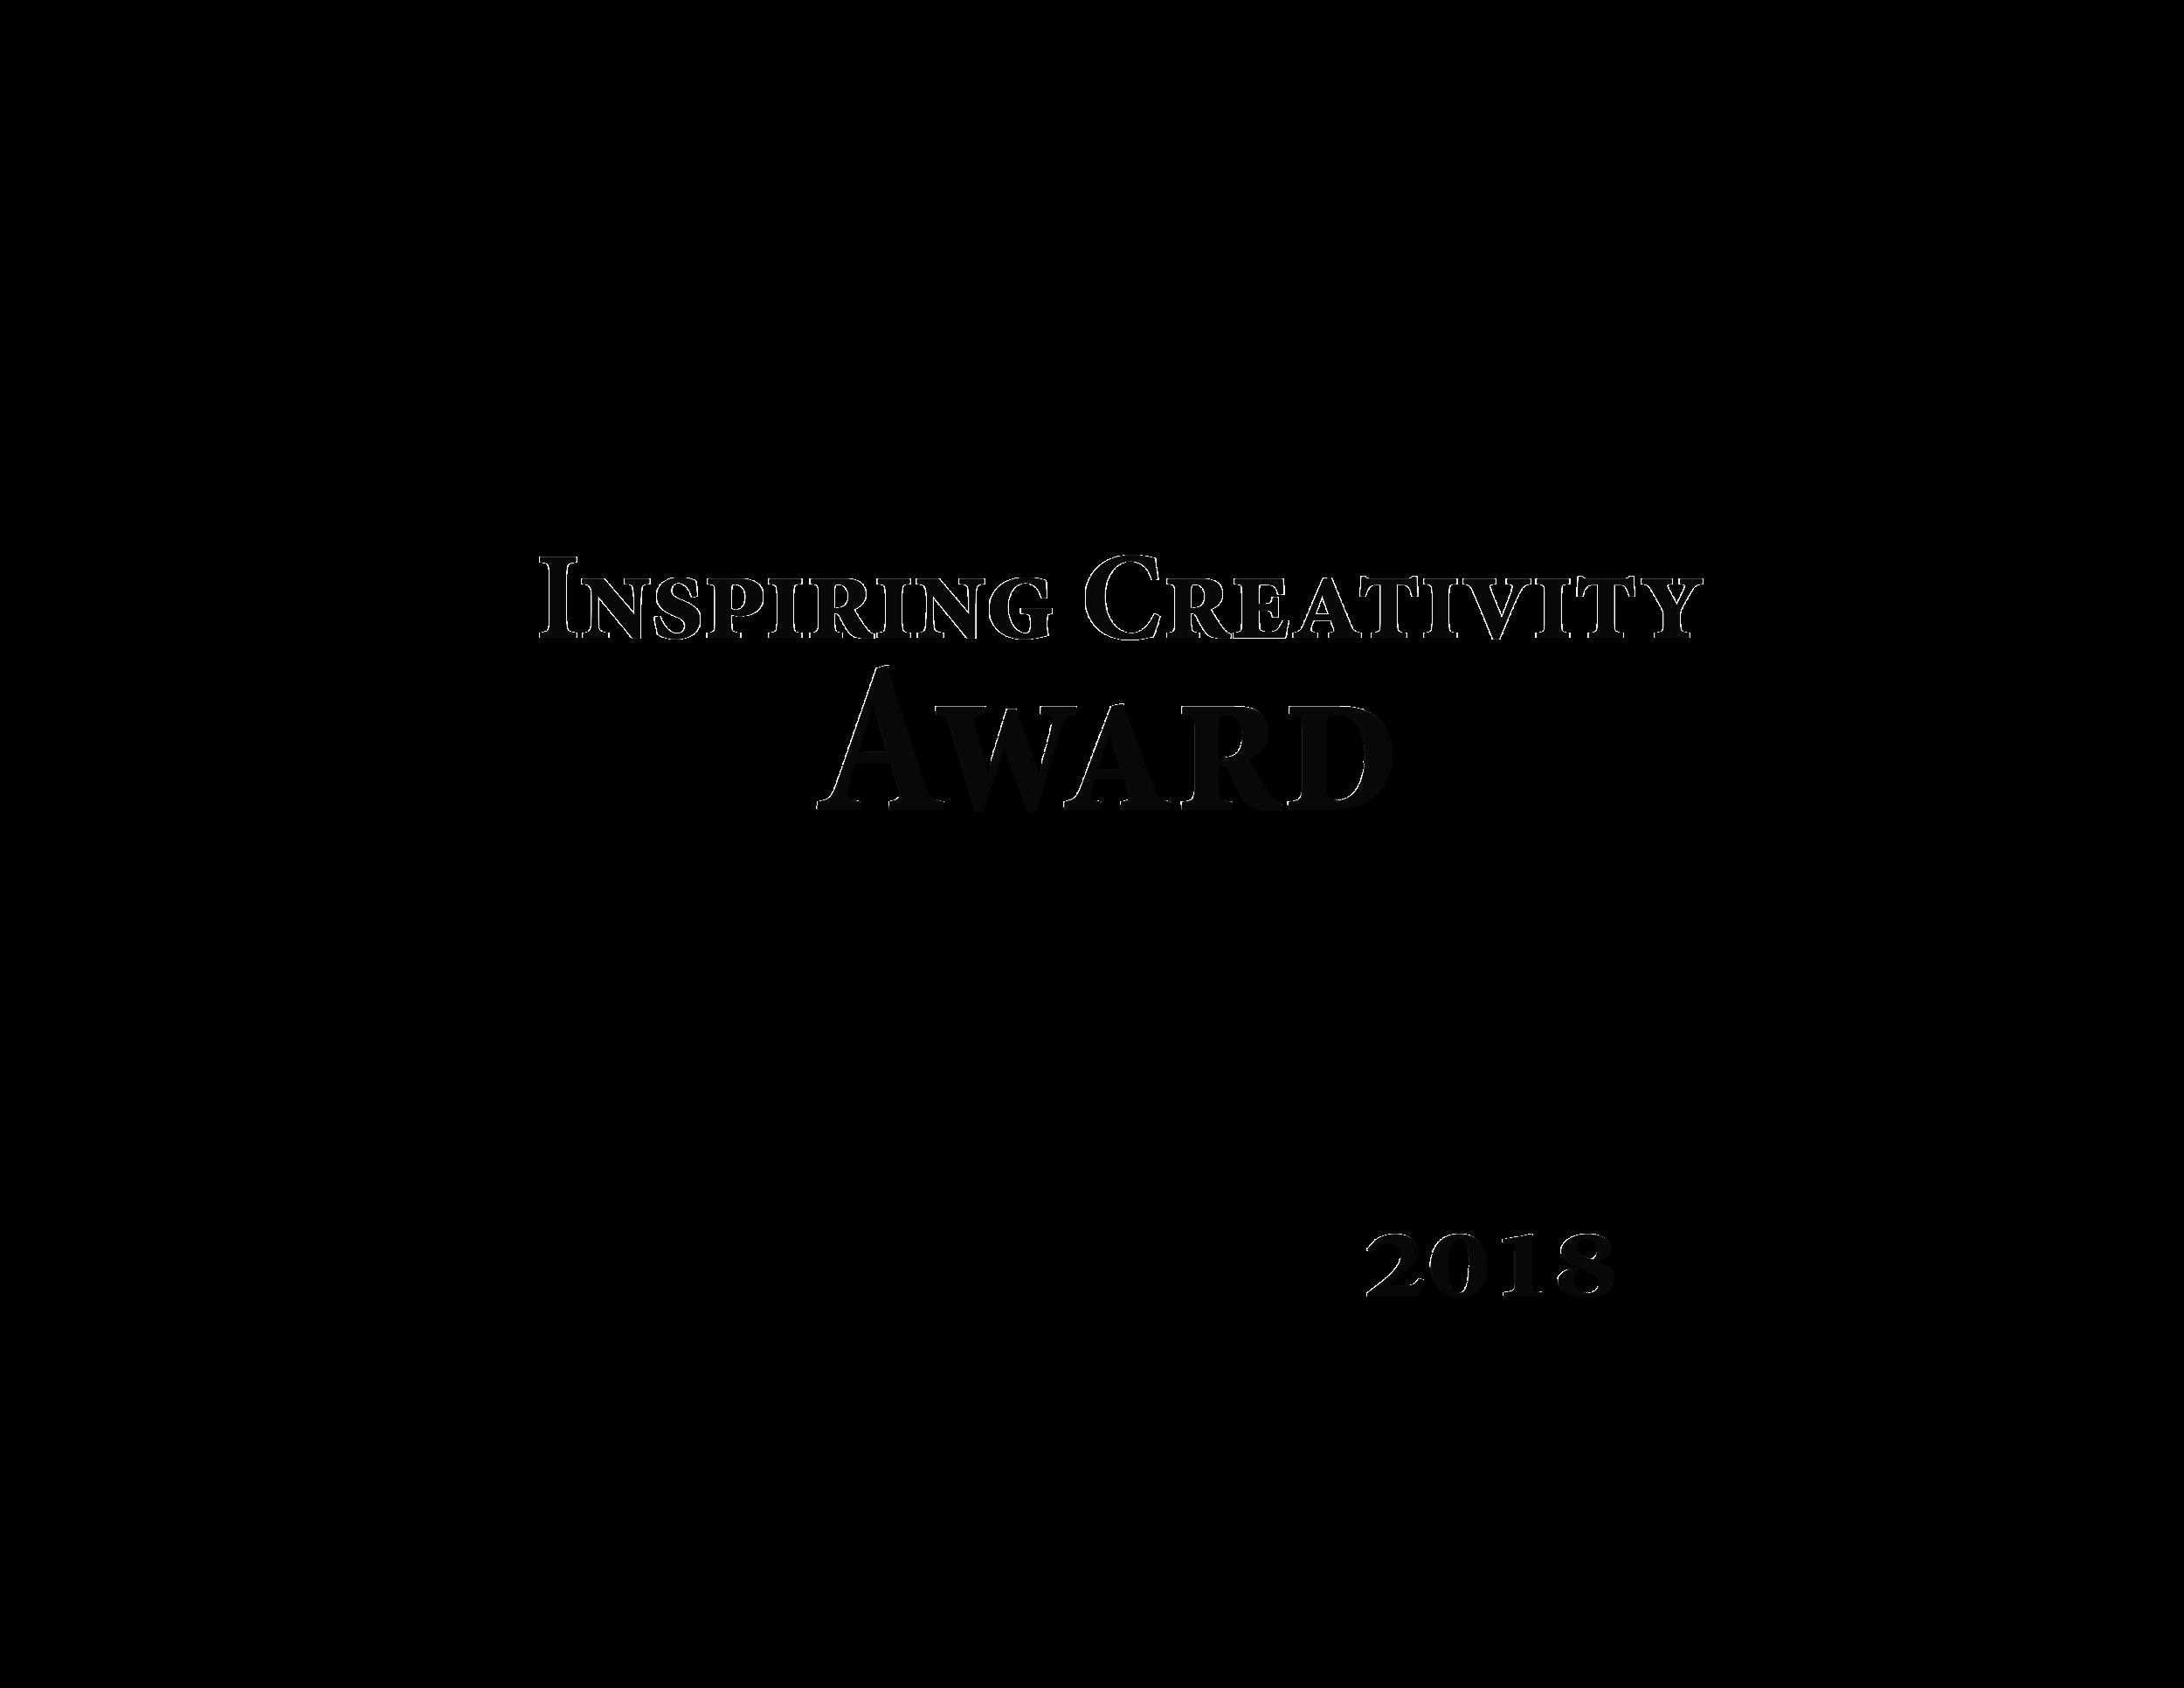 inspiring creativity award no poetry.png